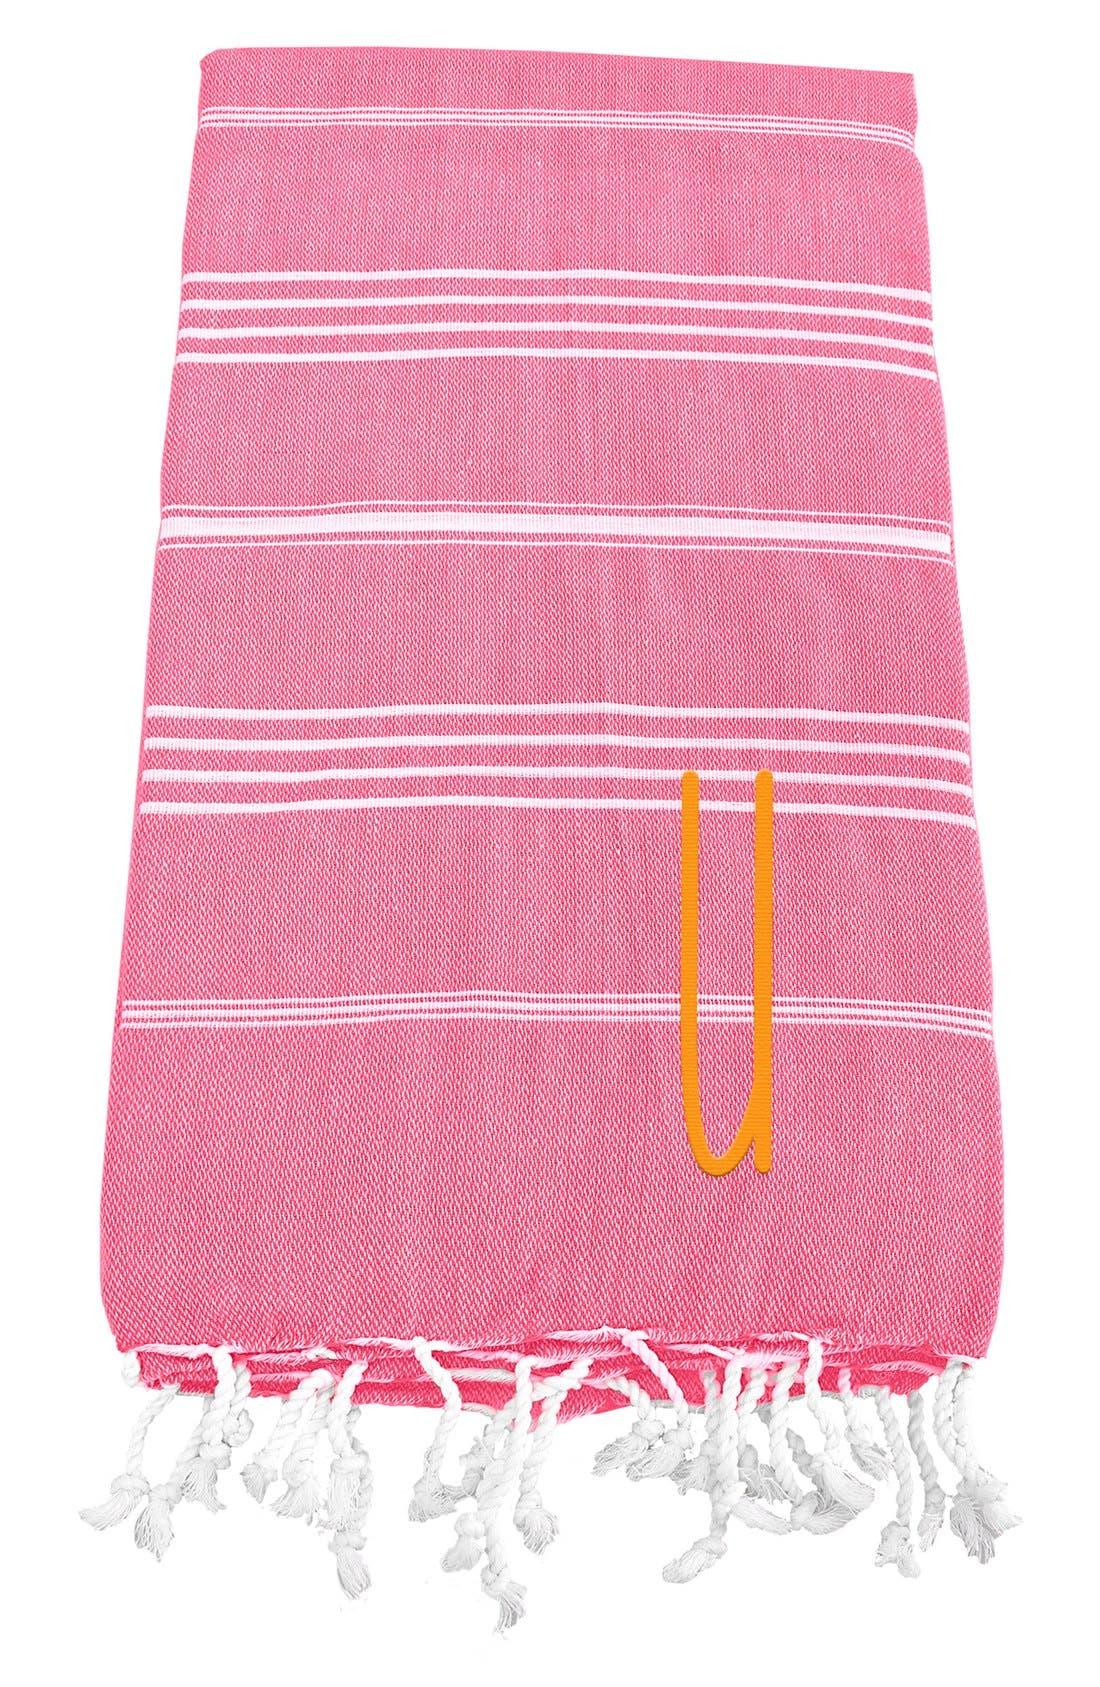 Monogram Turkish Cotton Towel,                             Main thumbnail 157, color,